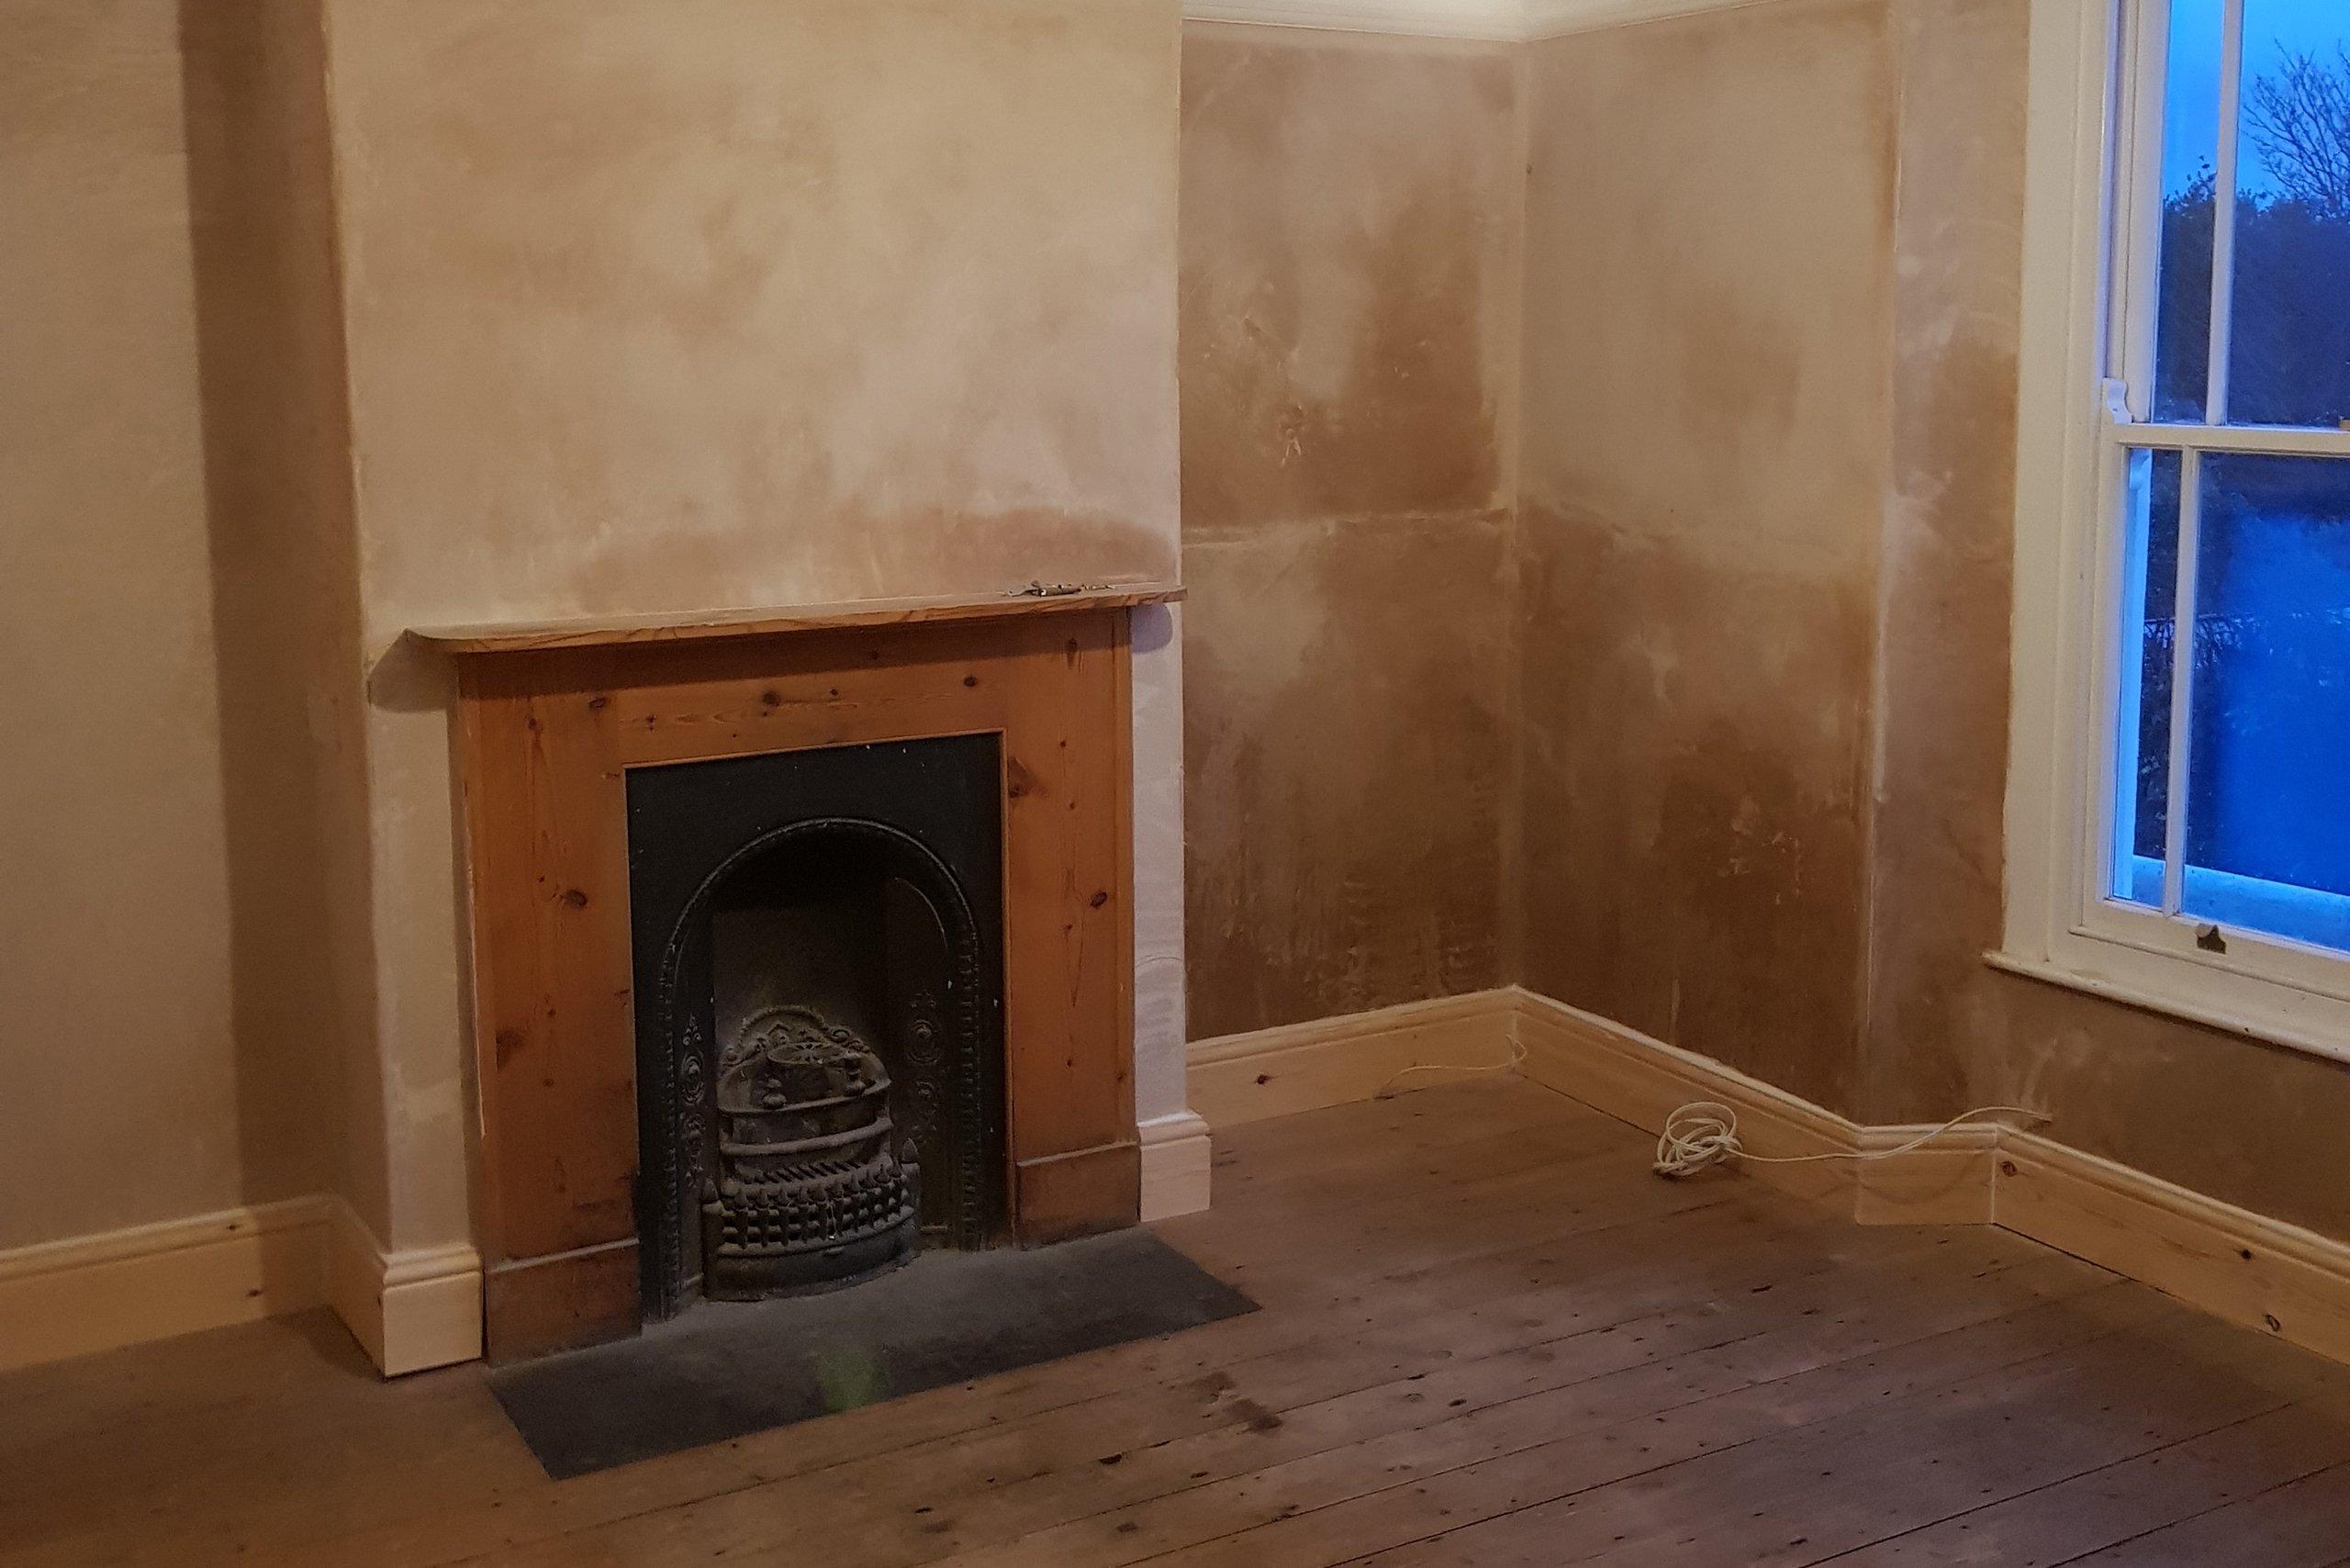 Renovation, plastering, survey services by Trust Preservation